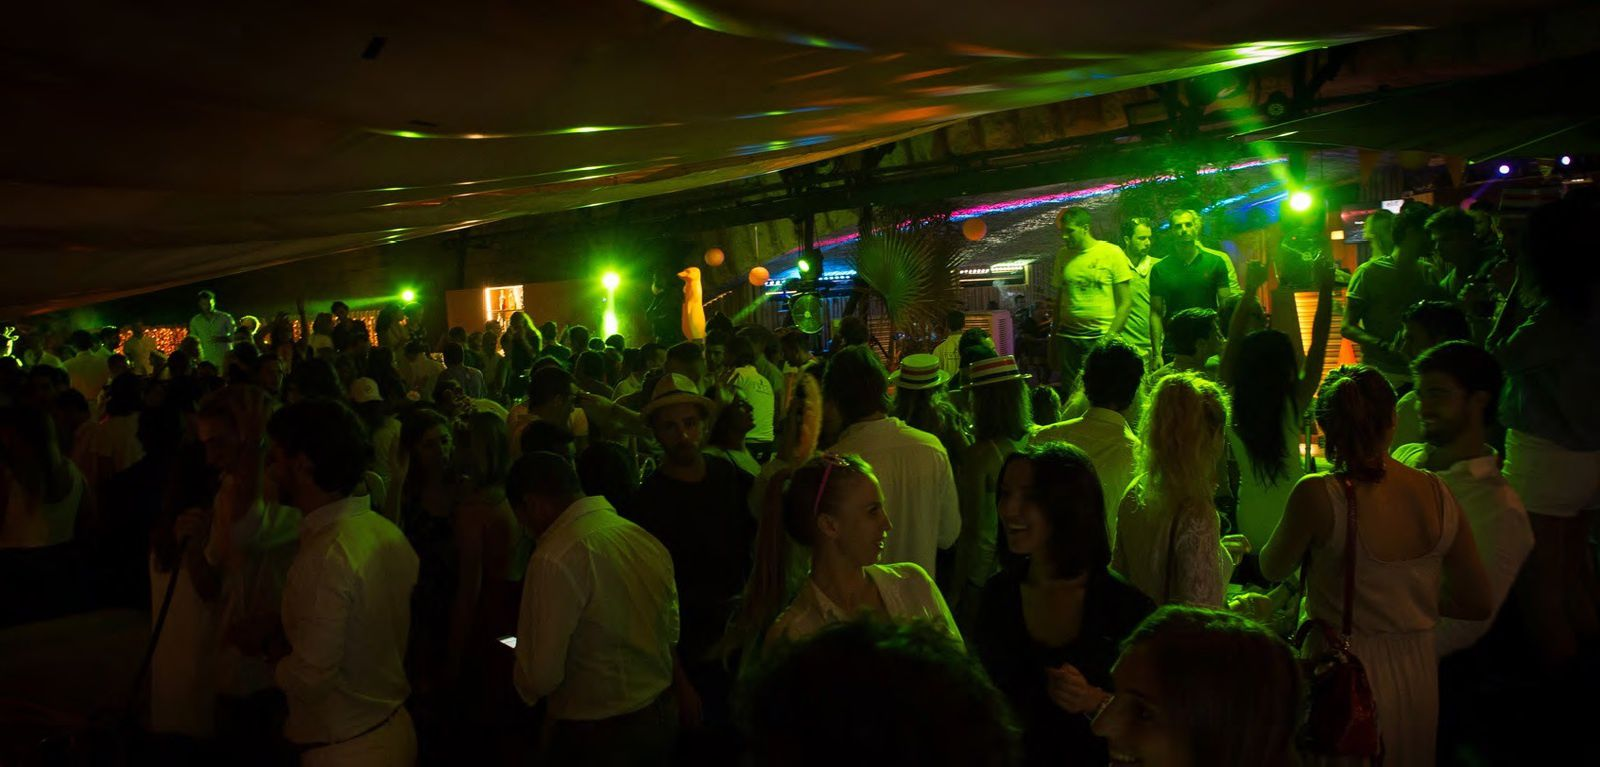 DEEP KLASSIFIED MUSIC FESTIVAL 48 HEURES DE MUSIQUE: GRIMALDI FORUM MONACO